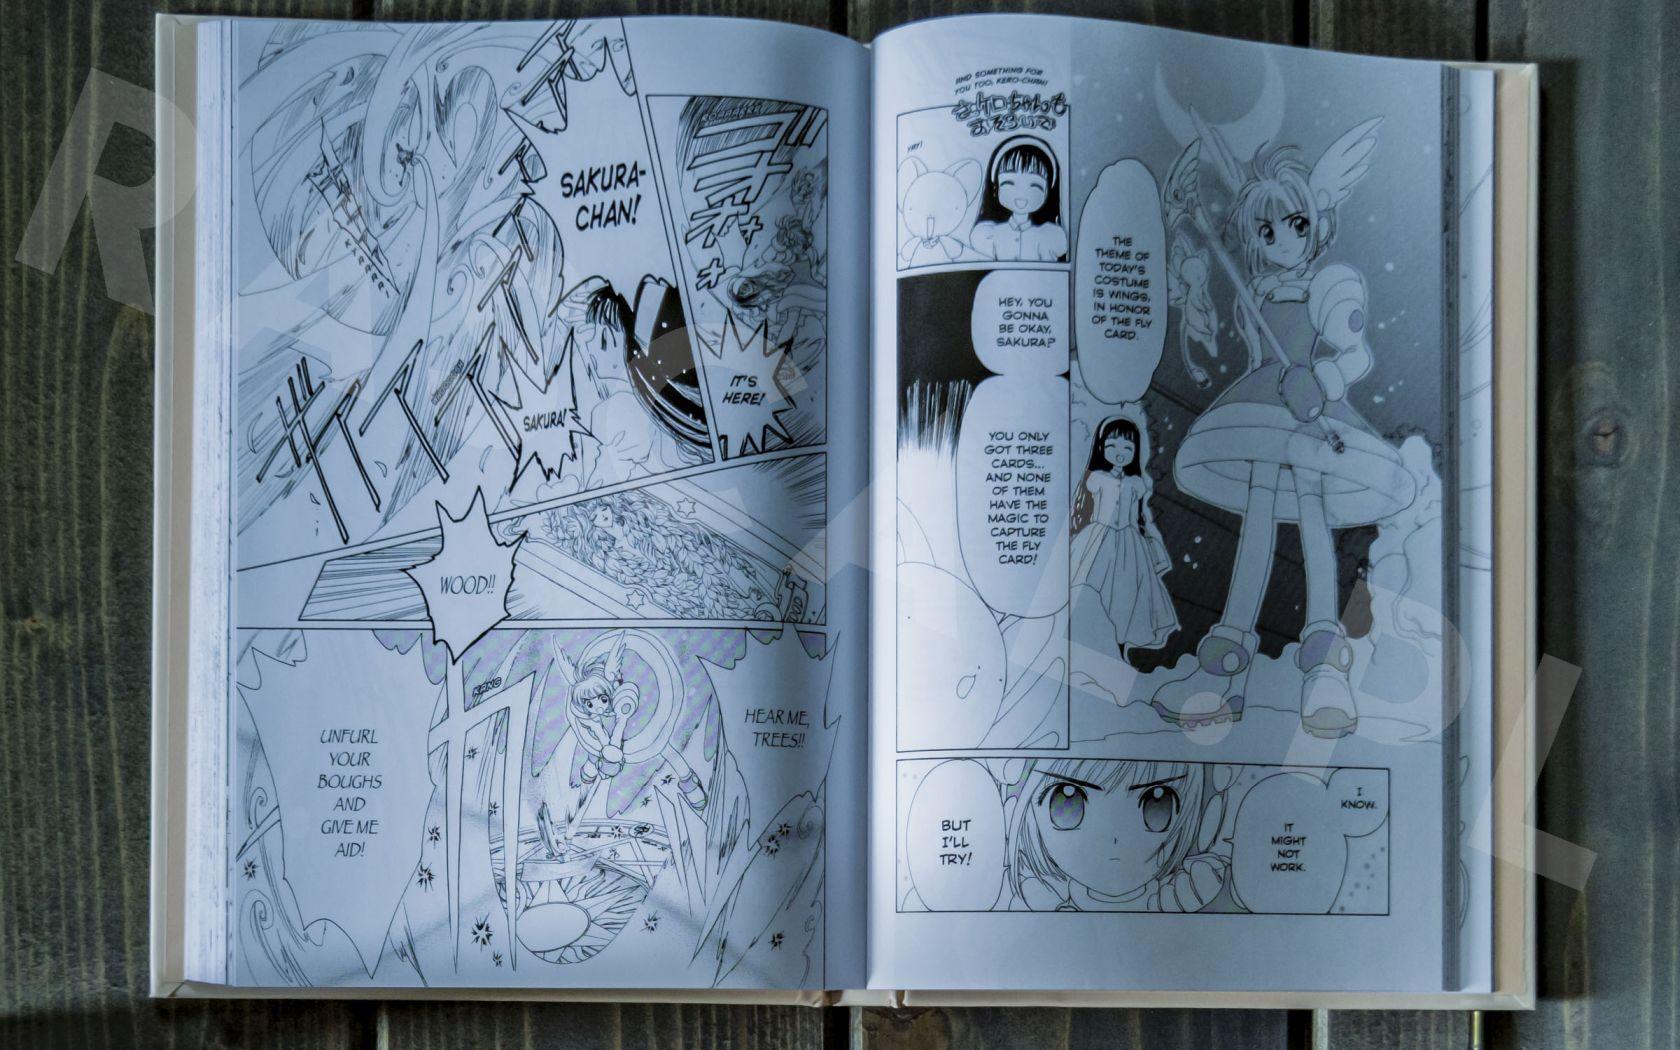 Cardcaptor Sakura Collector's Edition (1,2) - Seven Seas - Nowości w kolekcji mangi (listopad 2020) - rascal.pl